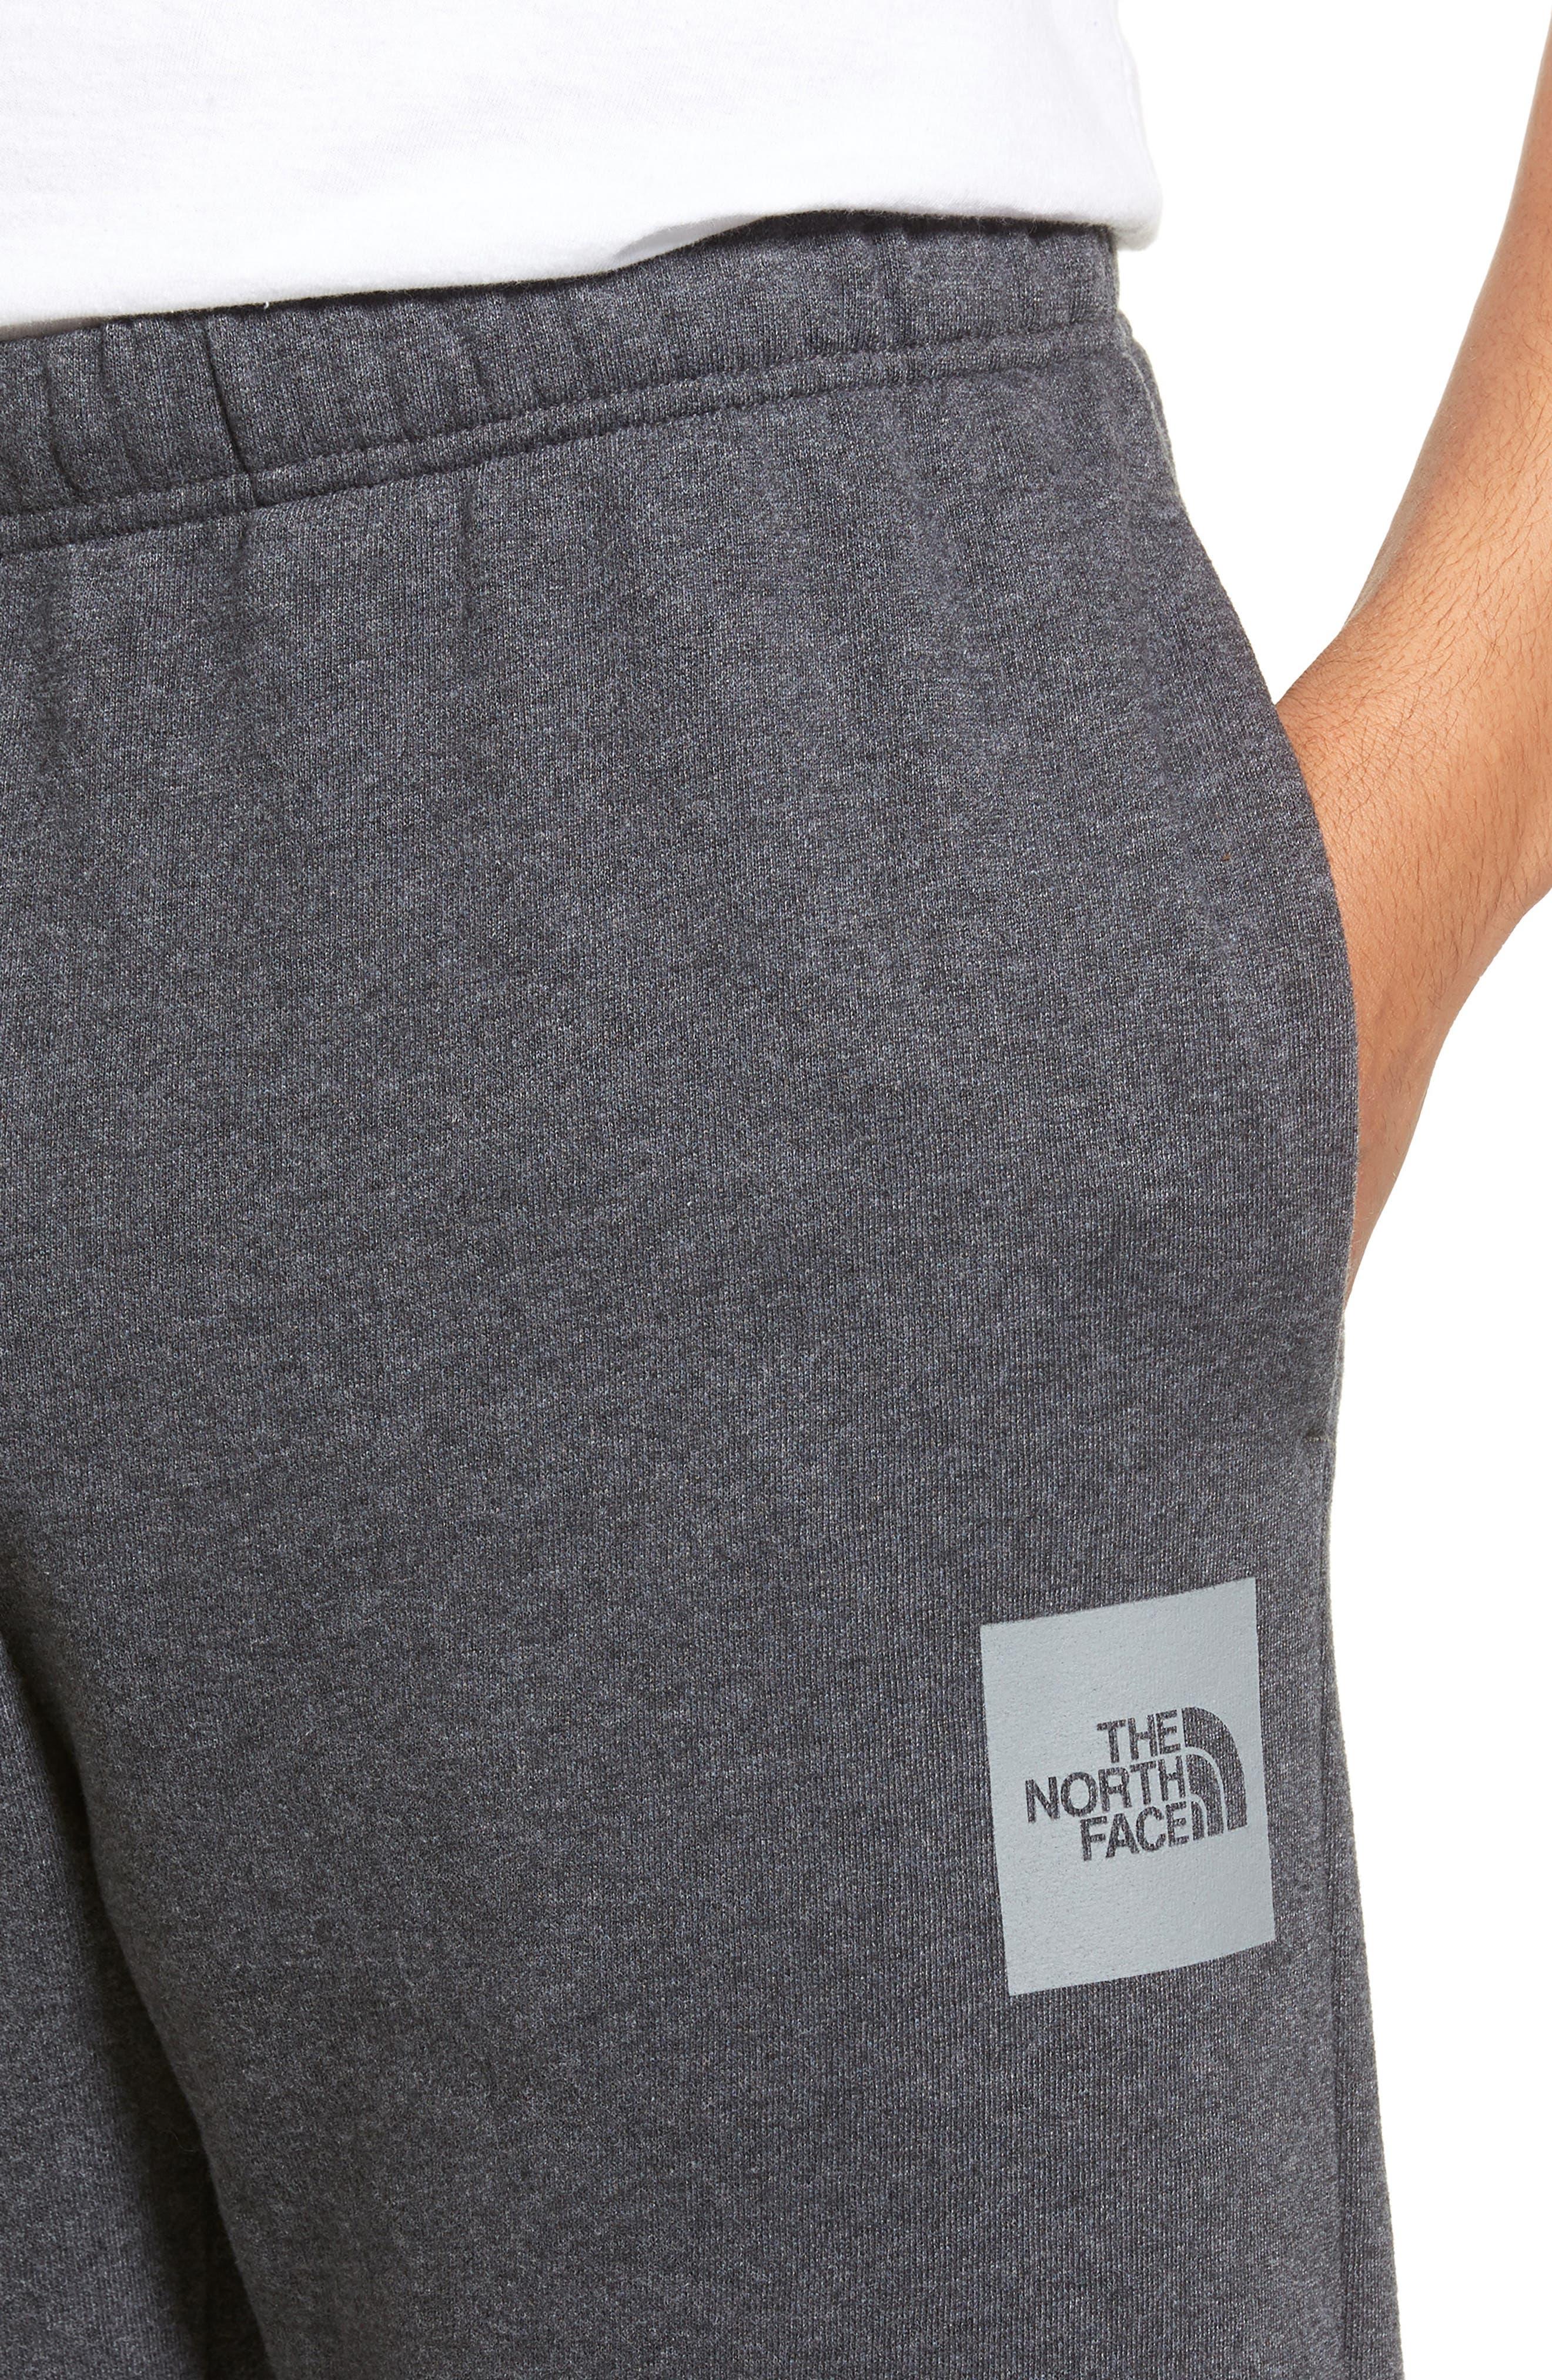 Reflective Never Stop Pants,                             Alternate thumbnail 4, color,                             Dark Grey Hthr/Monument Grey